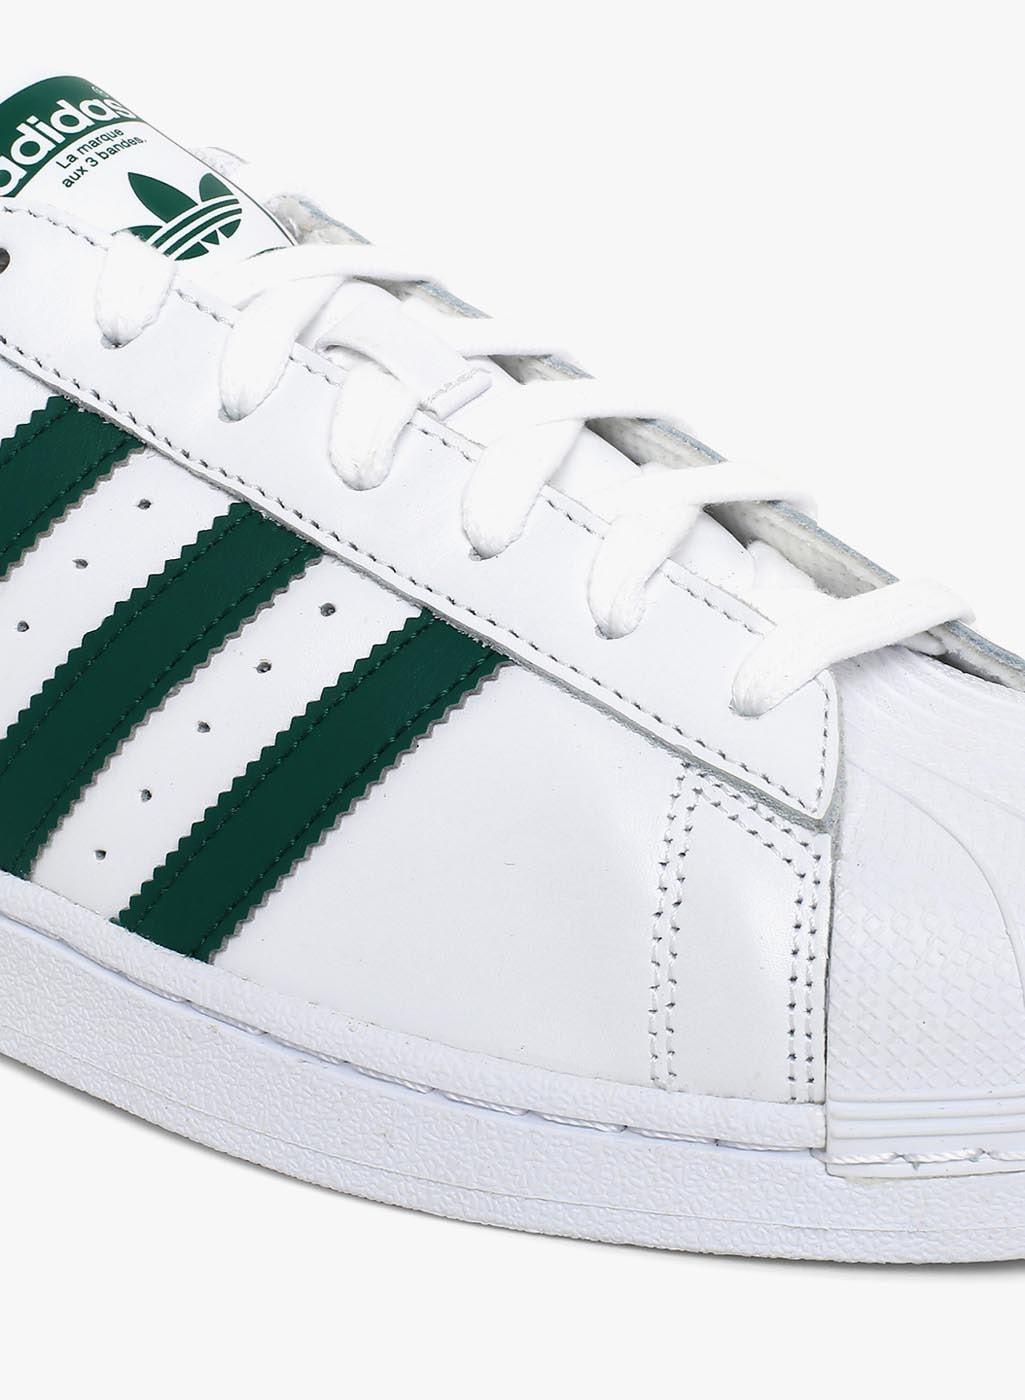 adidas superstar shoes jabong